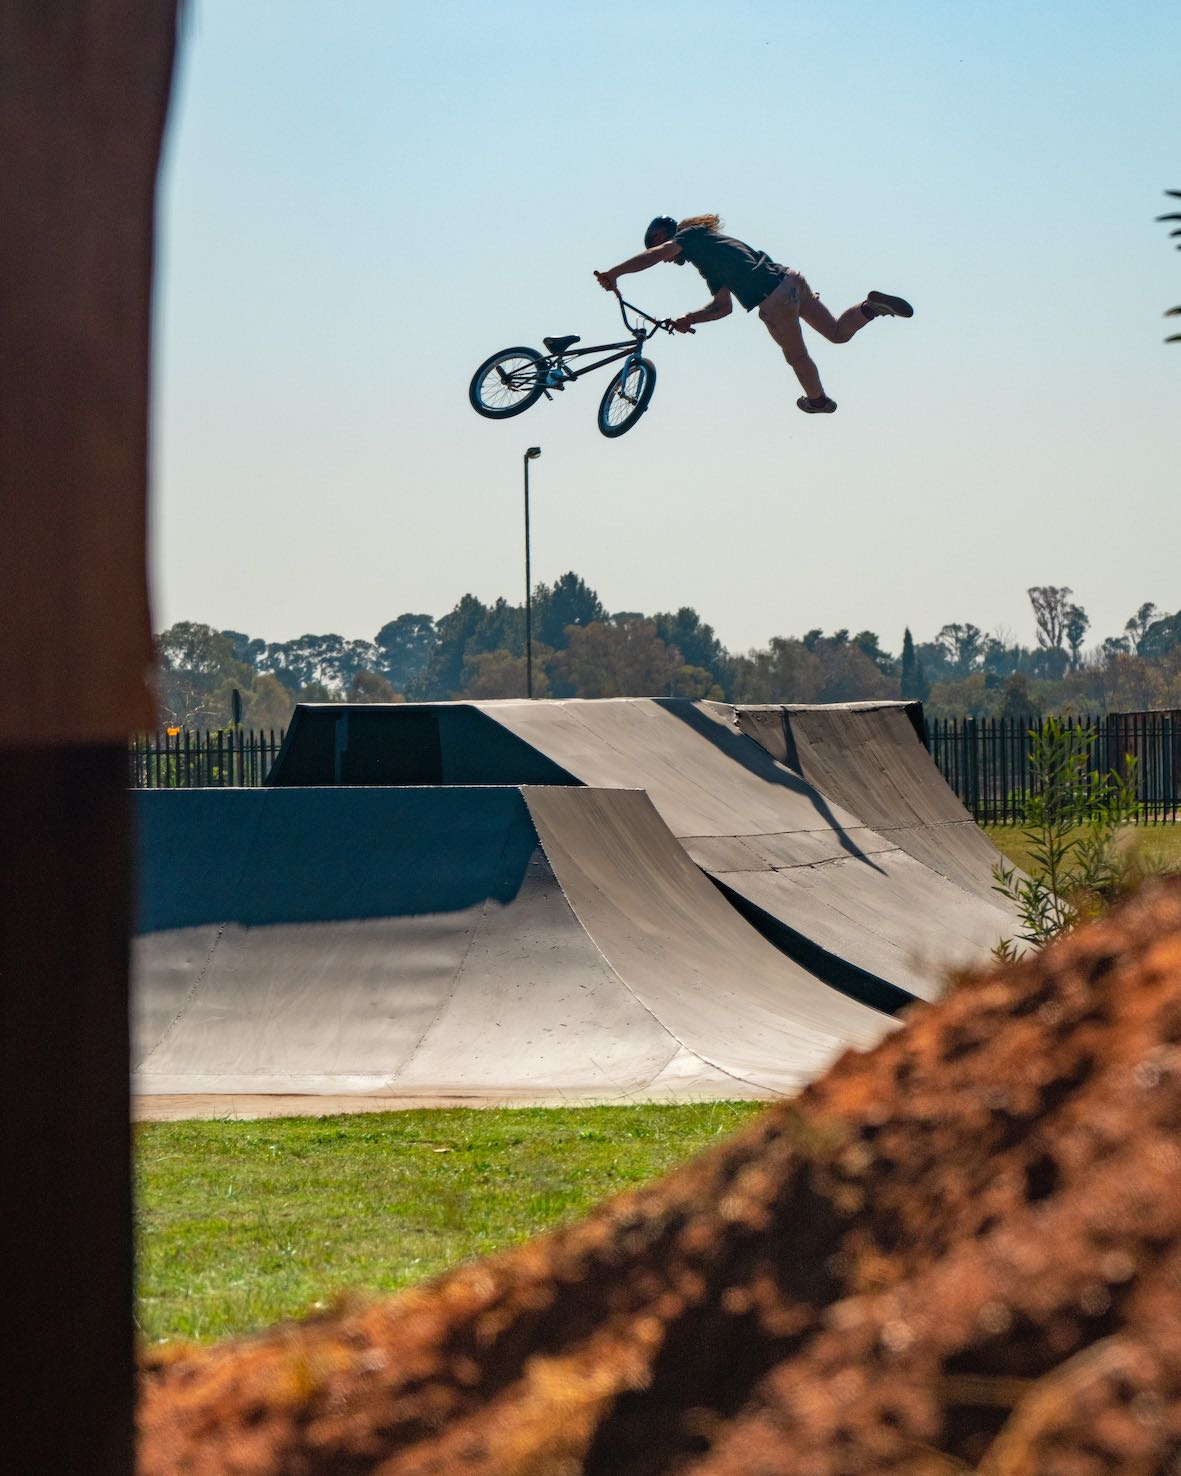 Watch Vincent Leygonie's BMX video part, Backyard Stoke